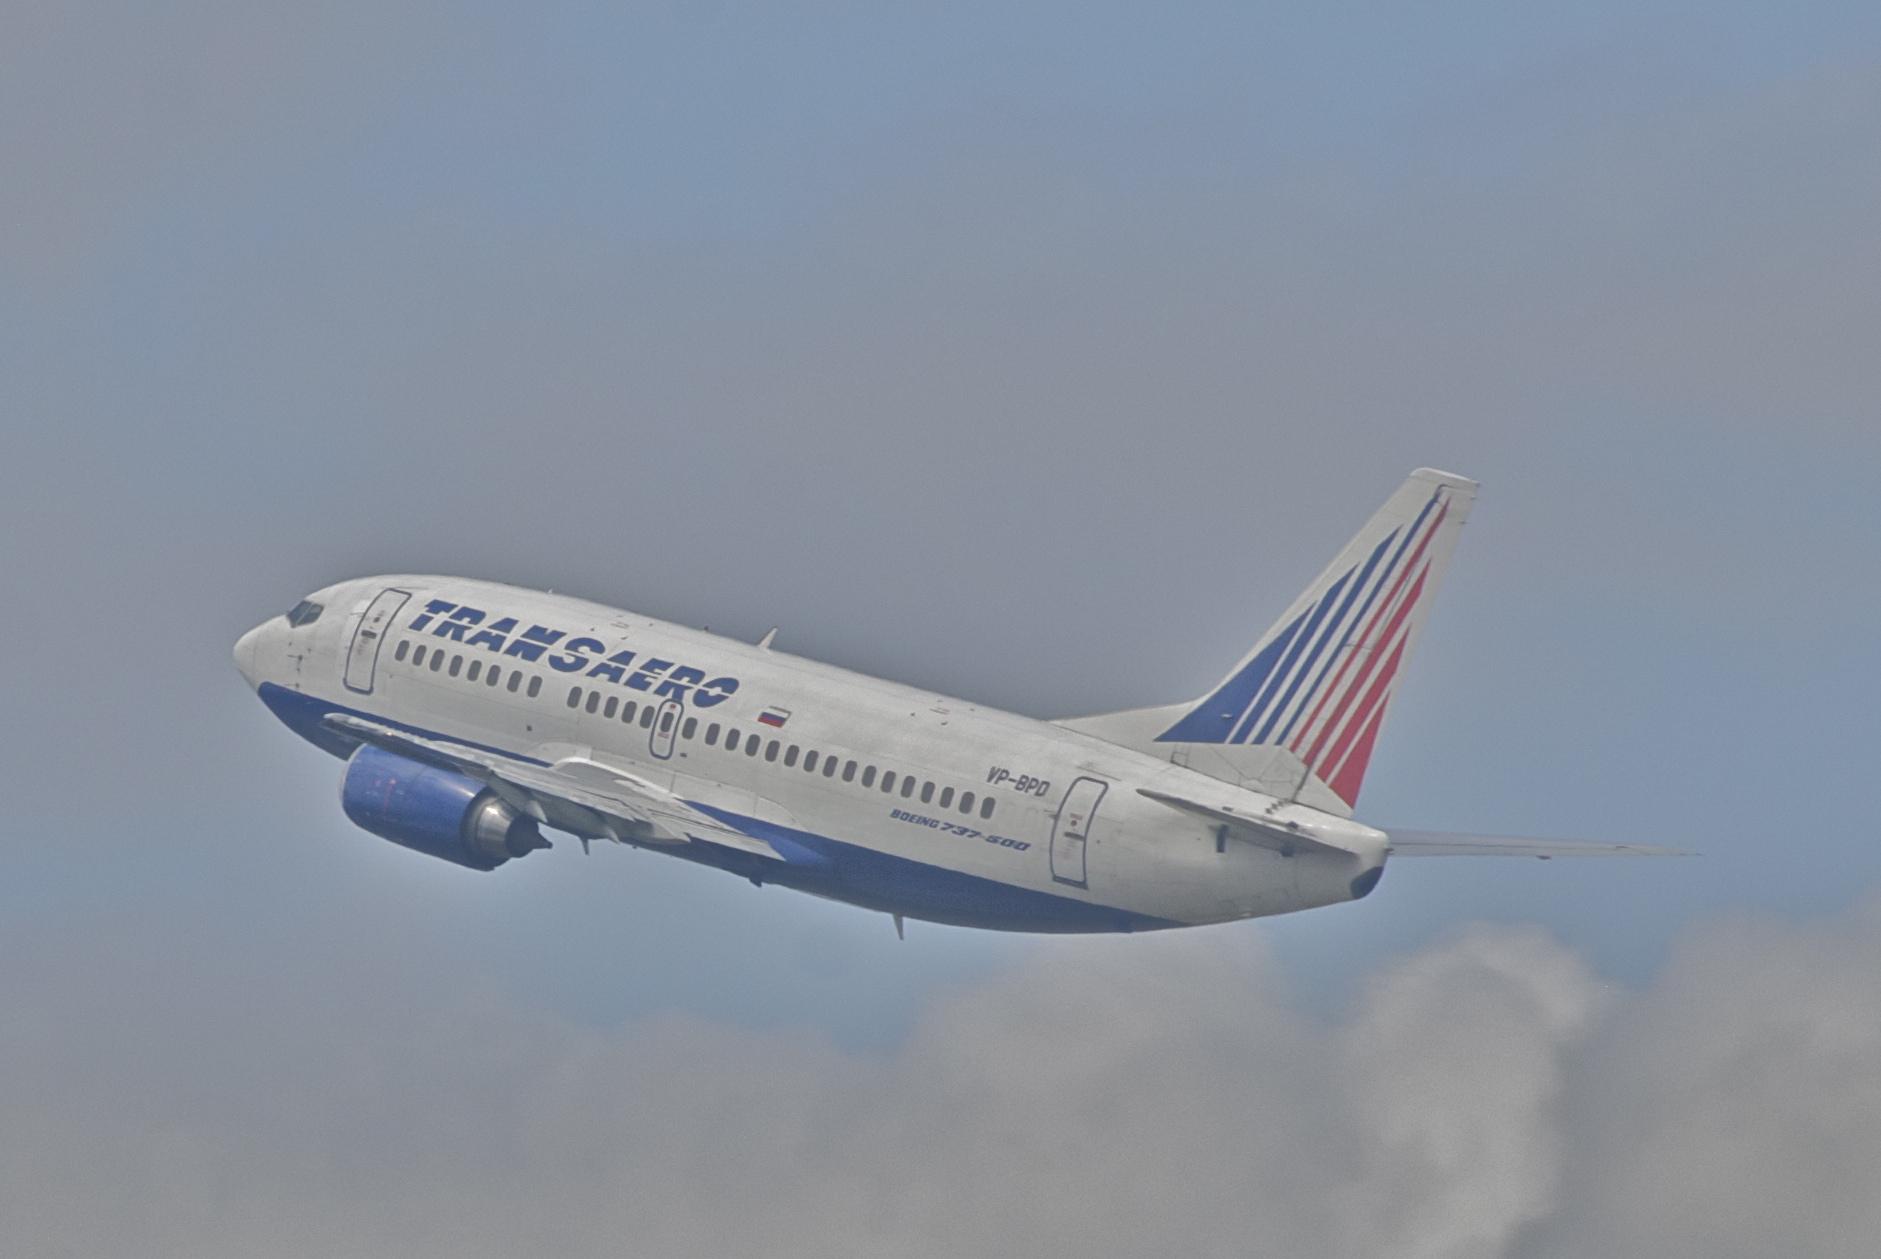 Схема боинга 737 трансаэро Боинг 737-500 схема салона лучшие места Boeing 737